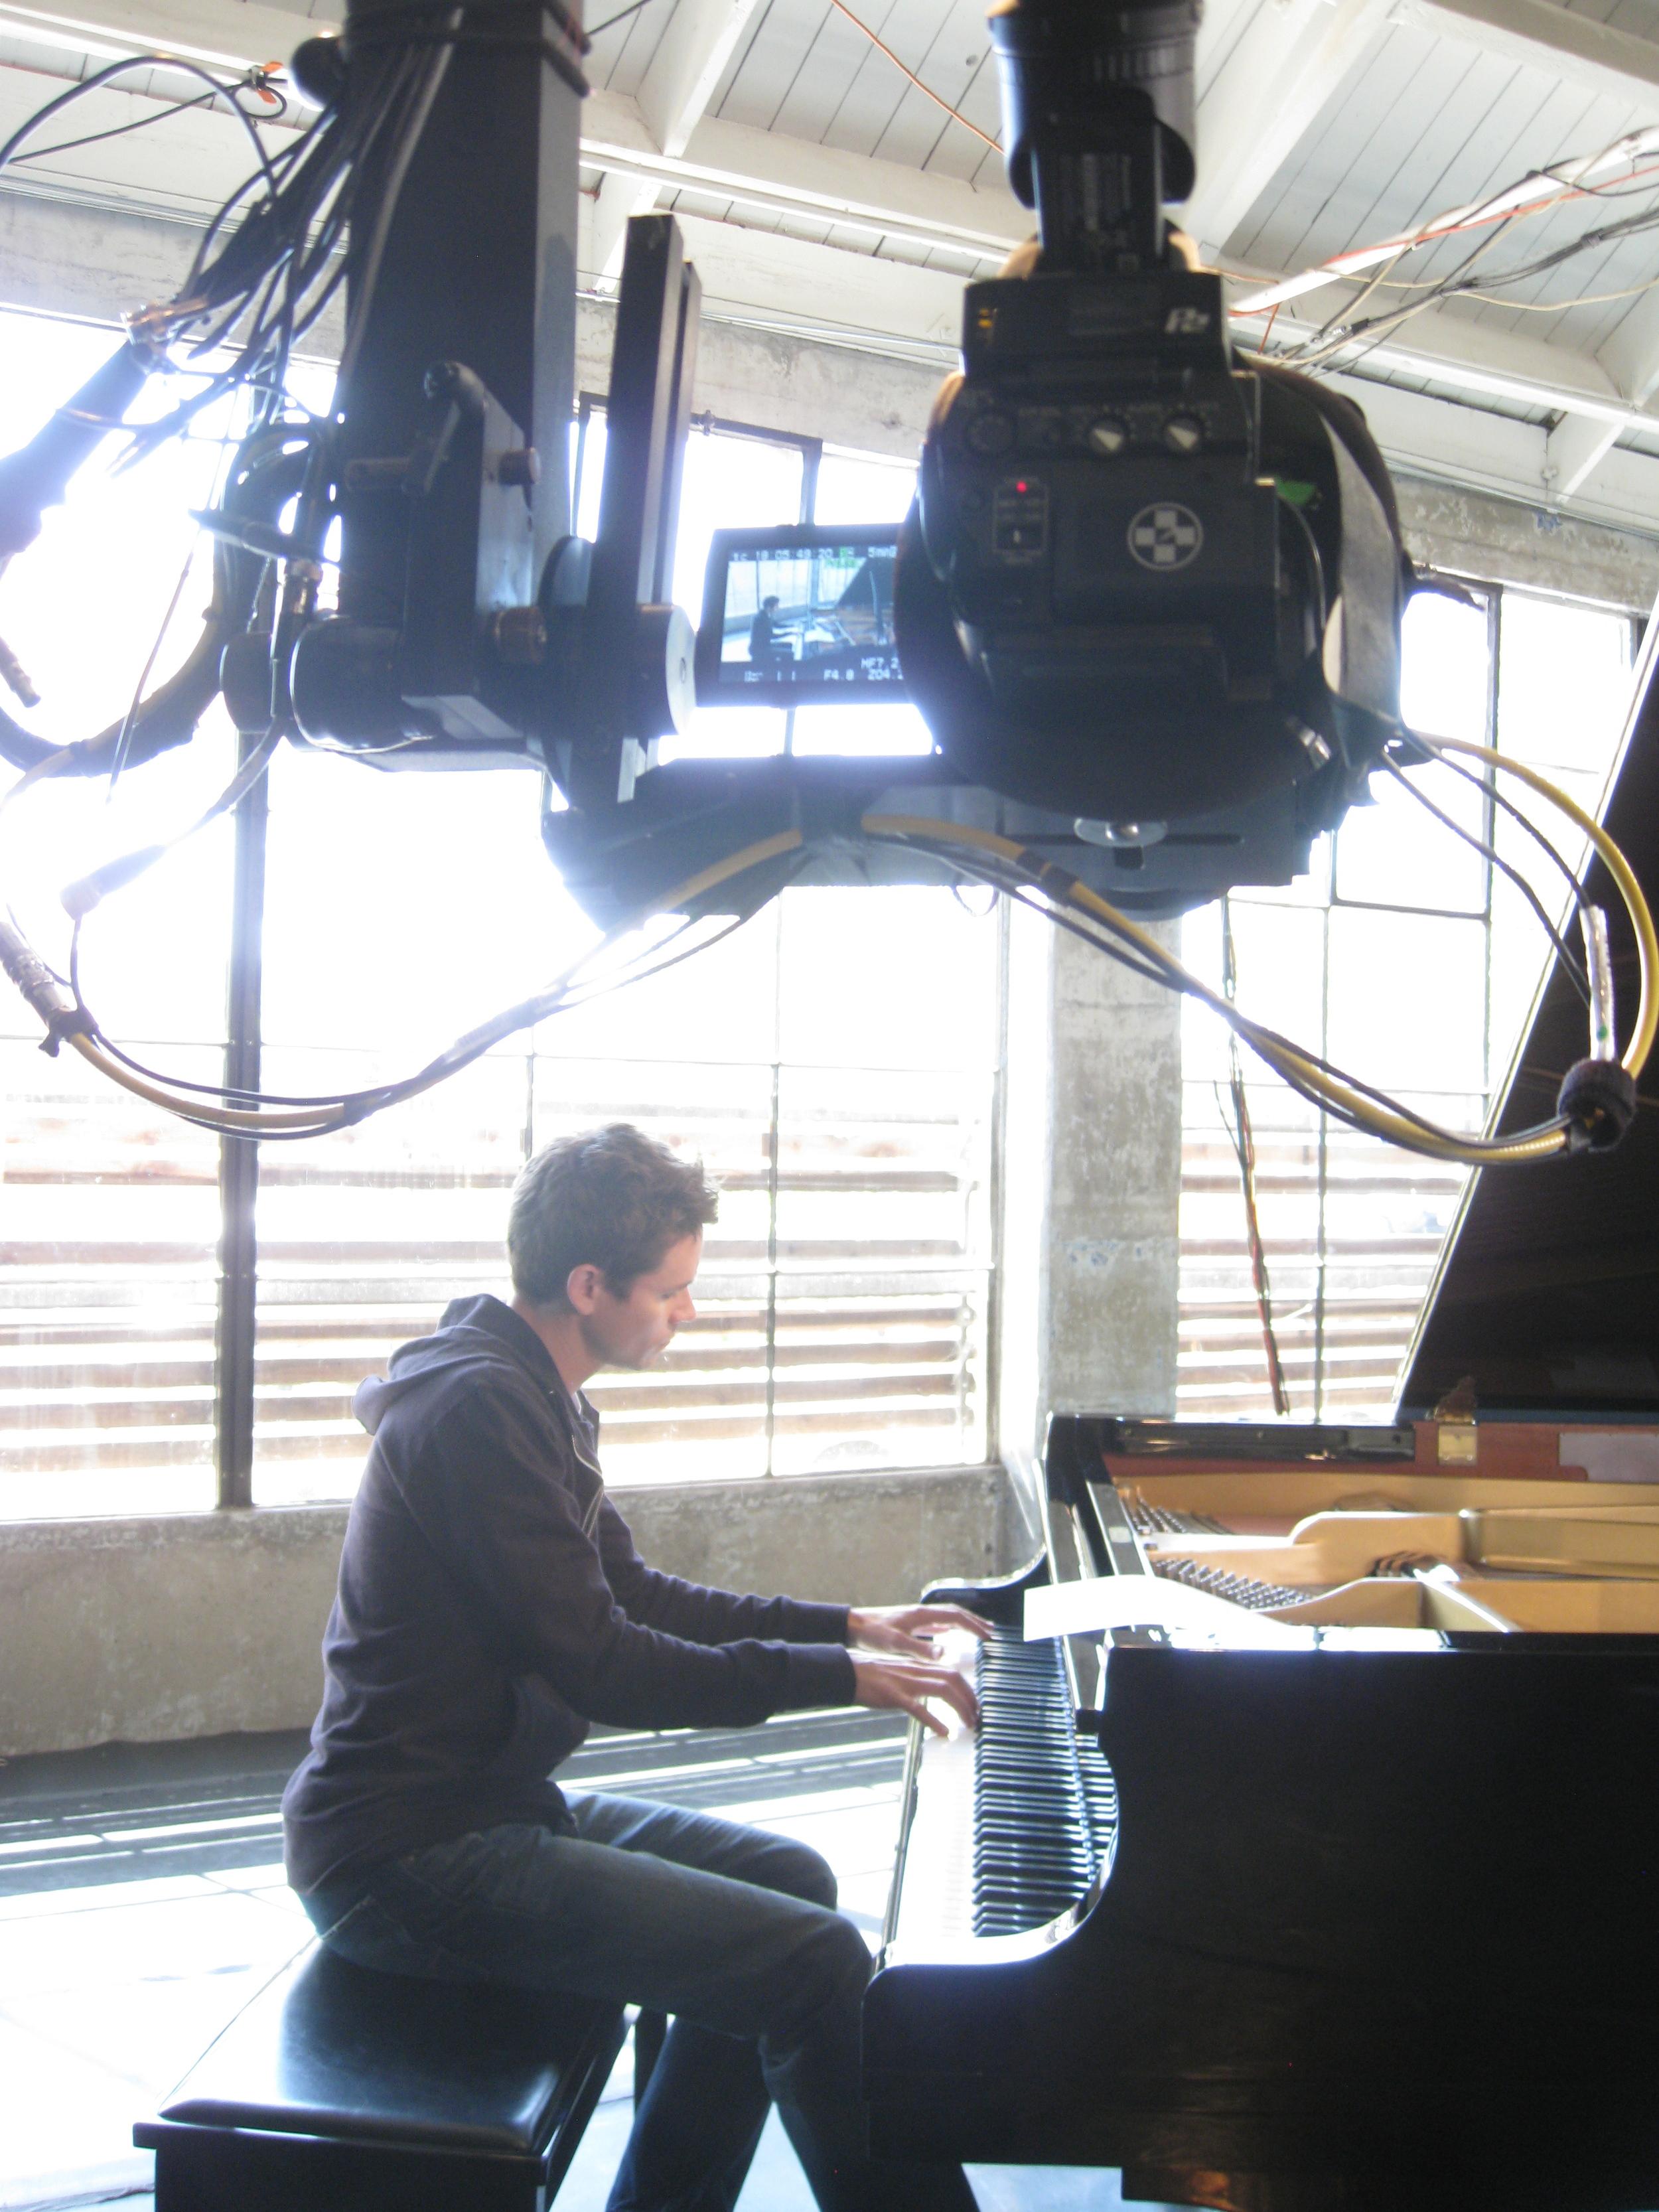 tina-guo-paul-spaeth-redemption-piano-cello-49.jpg